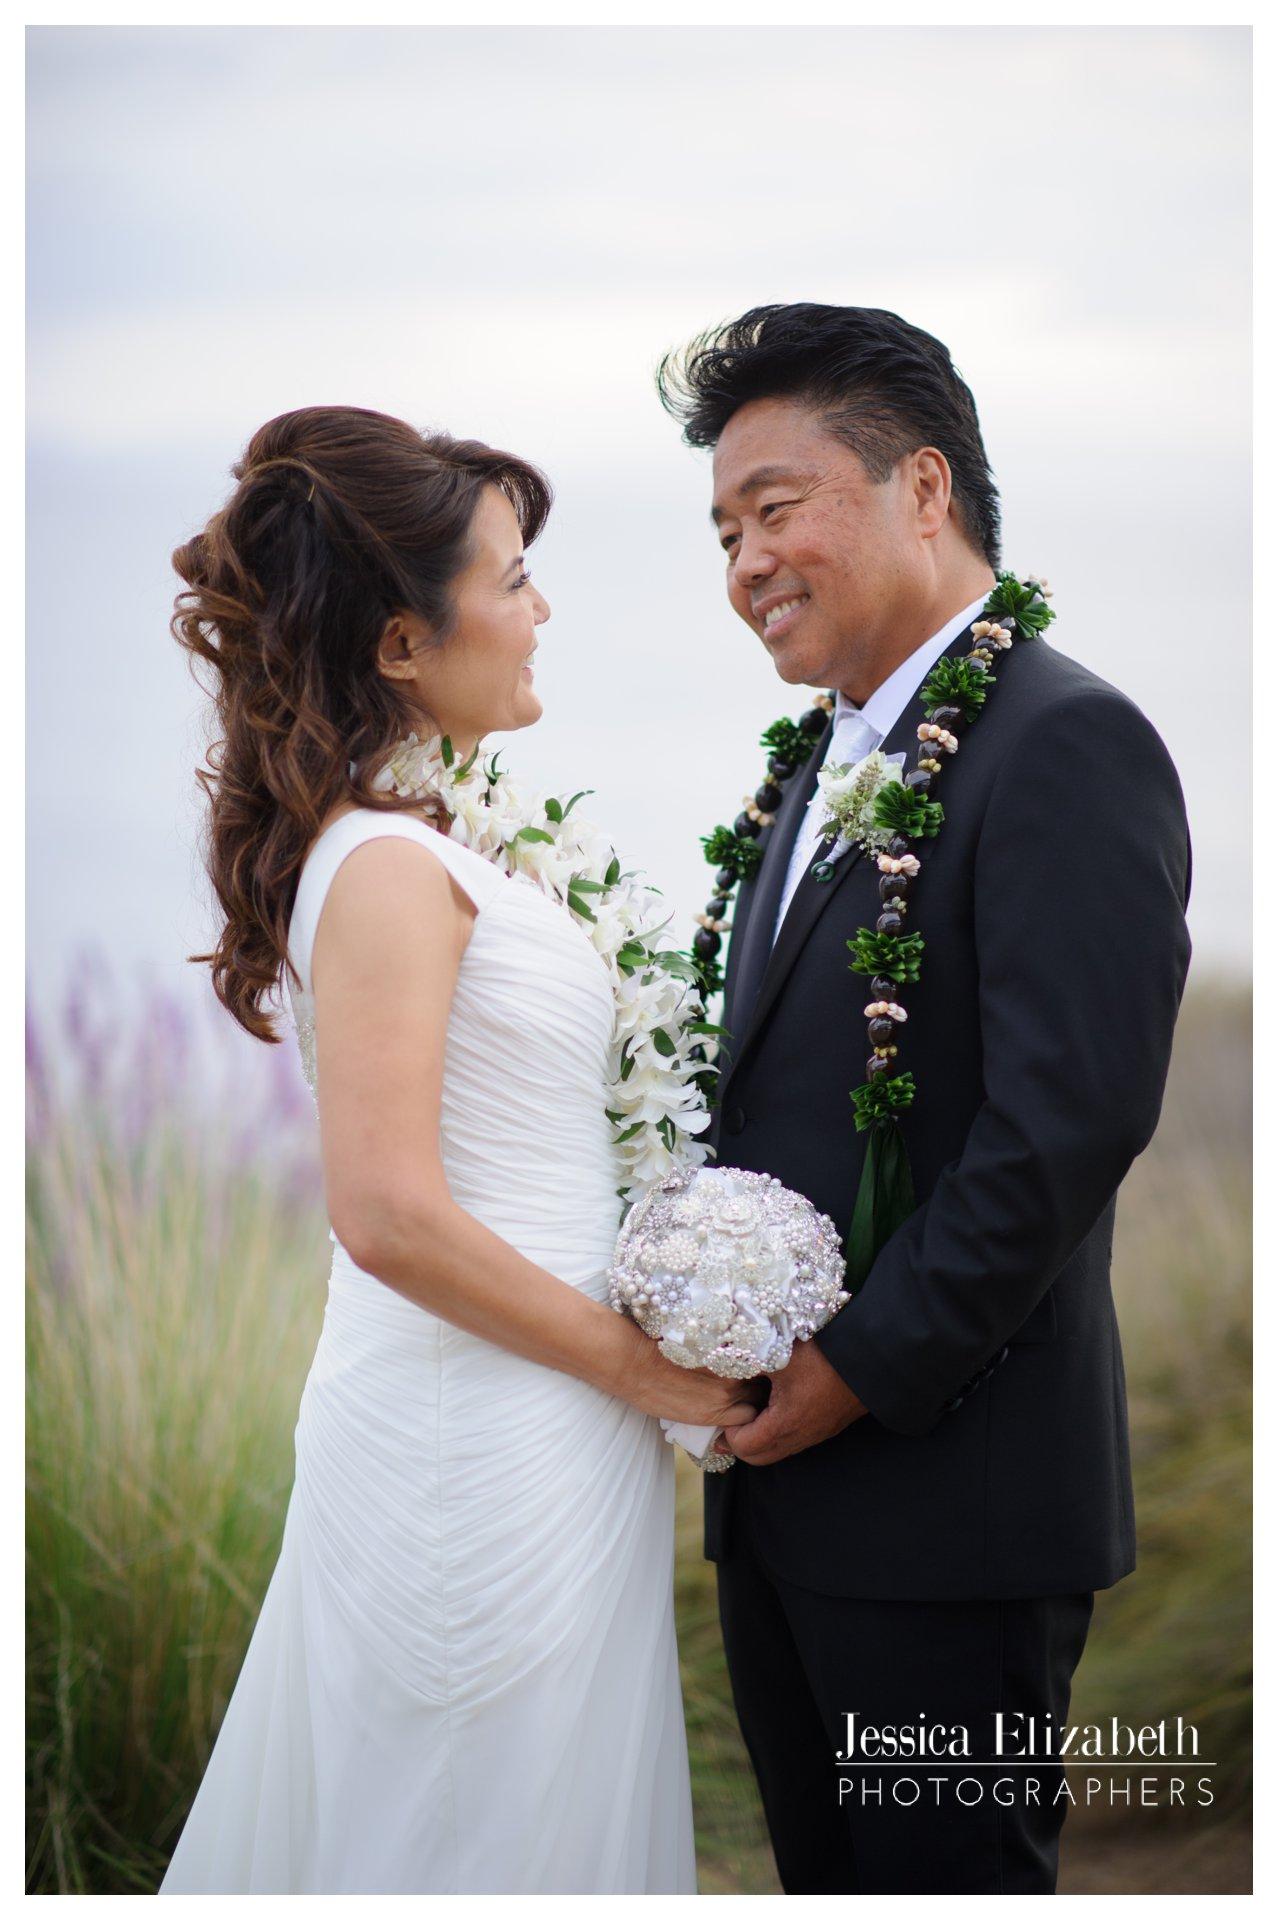 29-Terranea-Palos-Verdes-Wedding-Photography-by-Jessica-Elizabeth-w.jpg